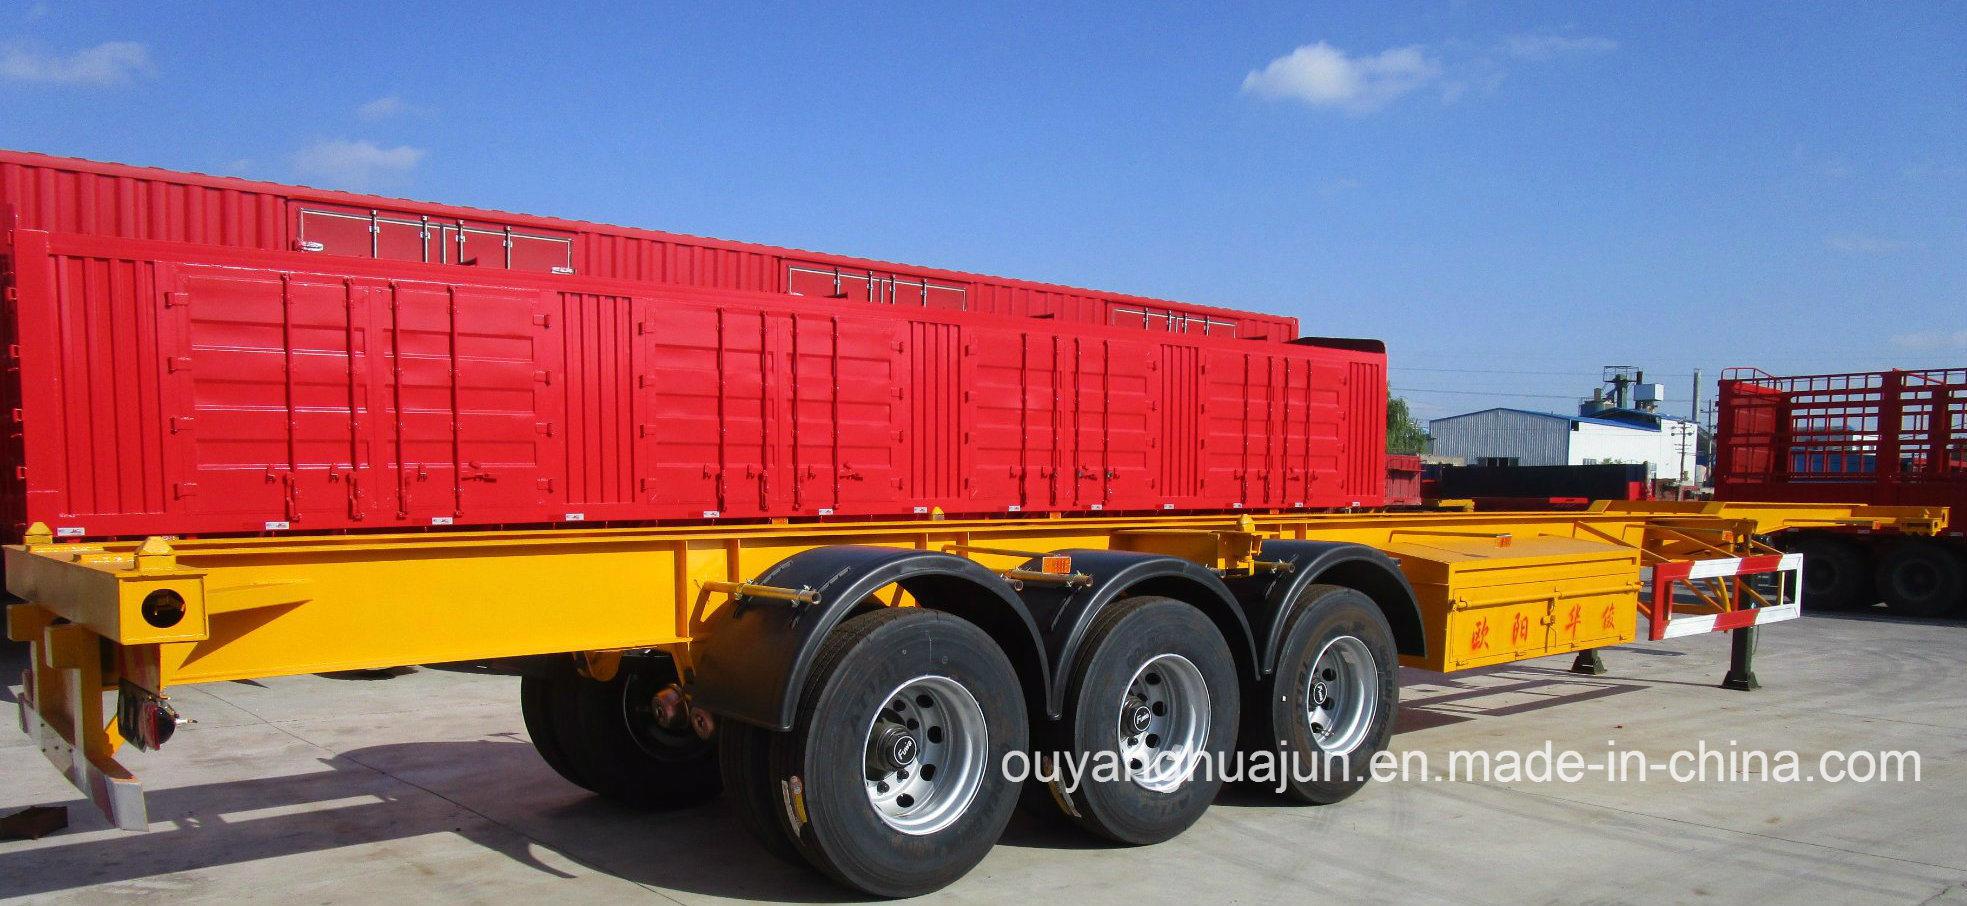 48 Feet Skeleton Container Semitrailer